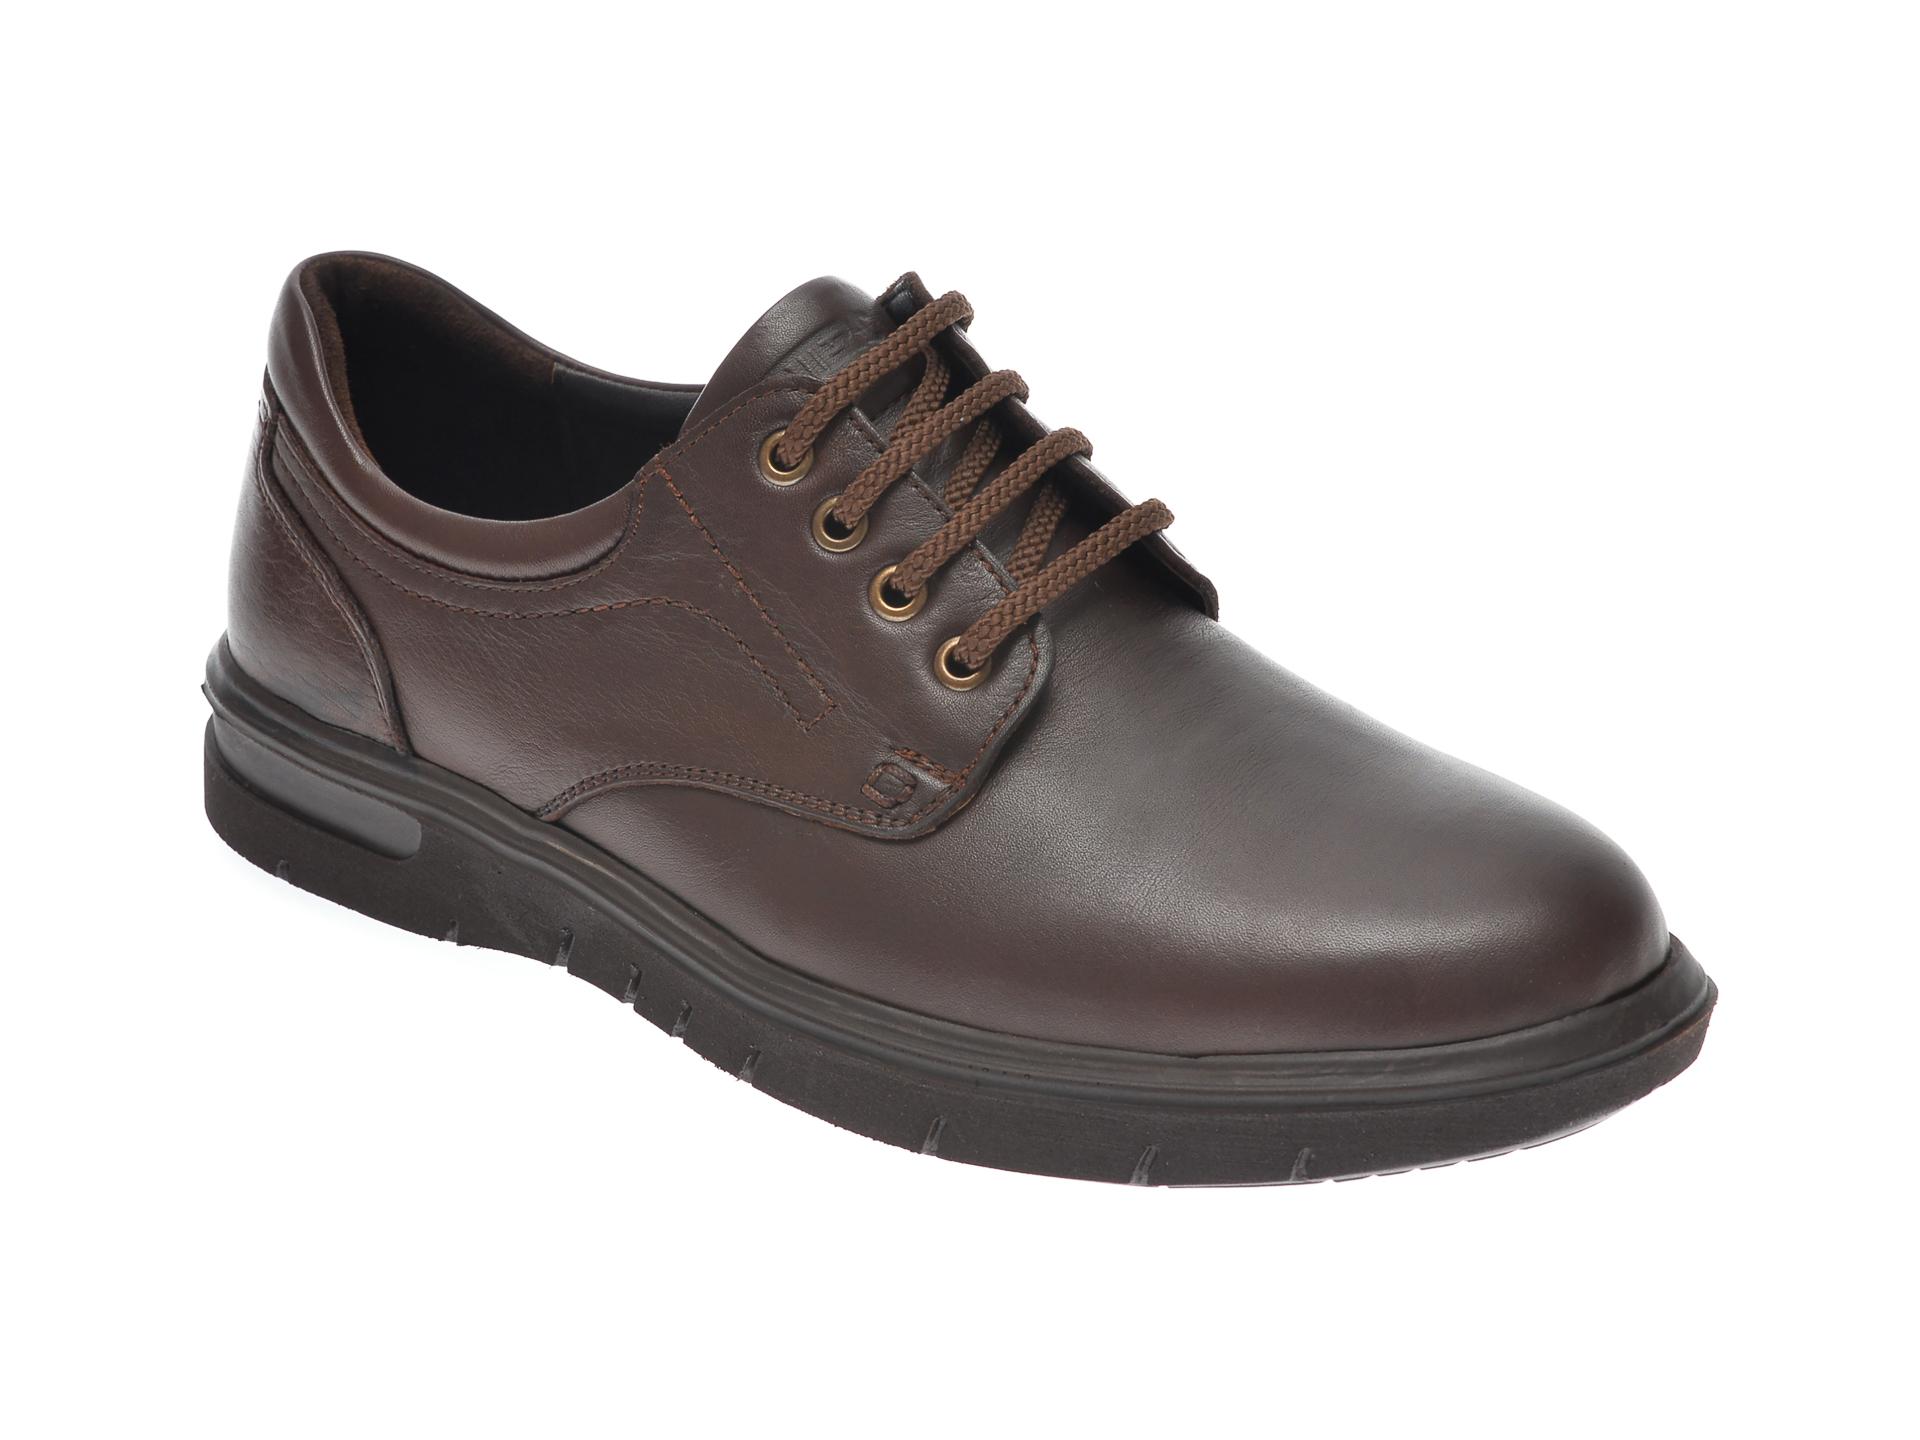 Pantofi OTTER maro, 2804, din piele naturala imagine